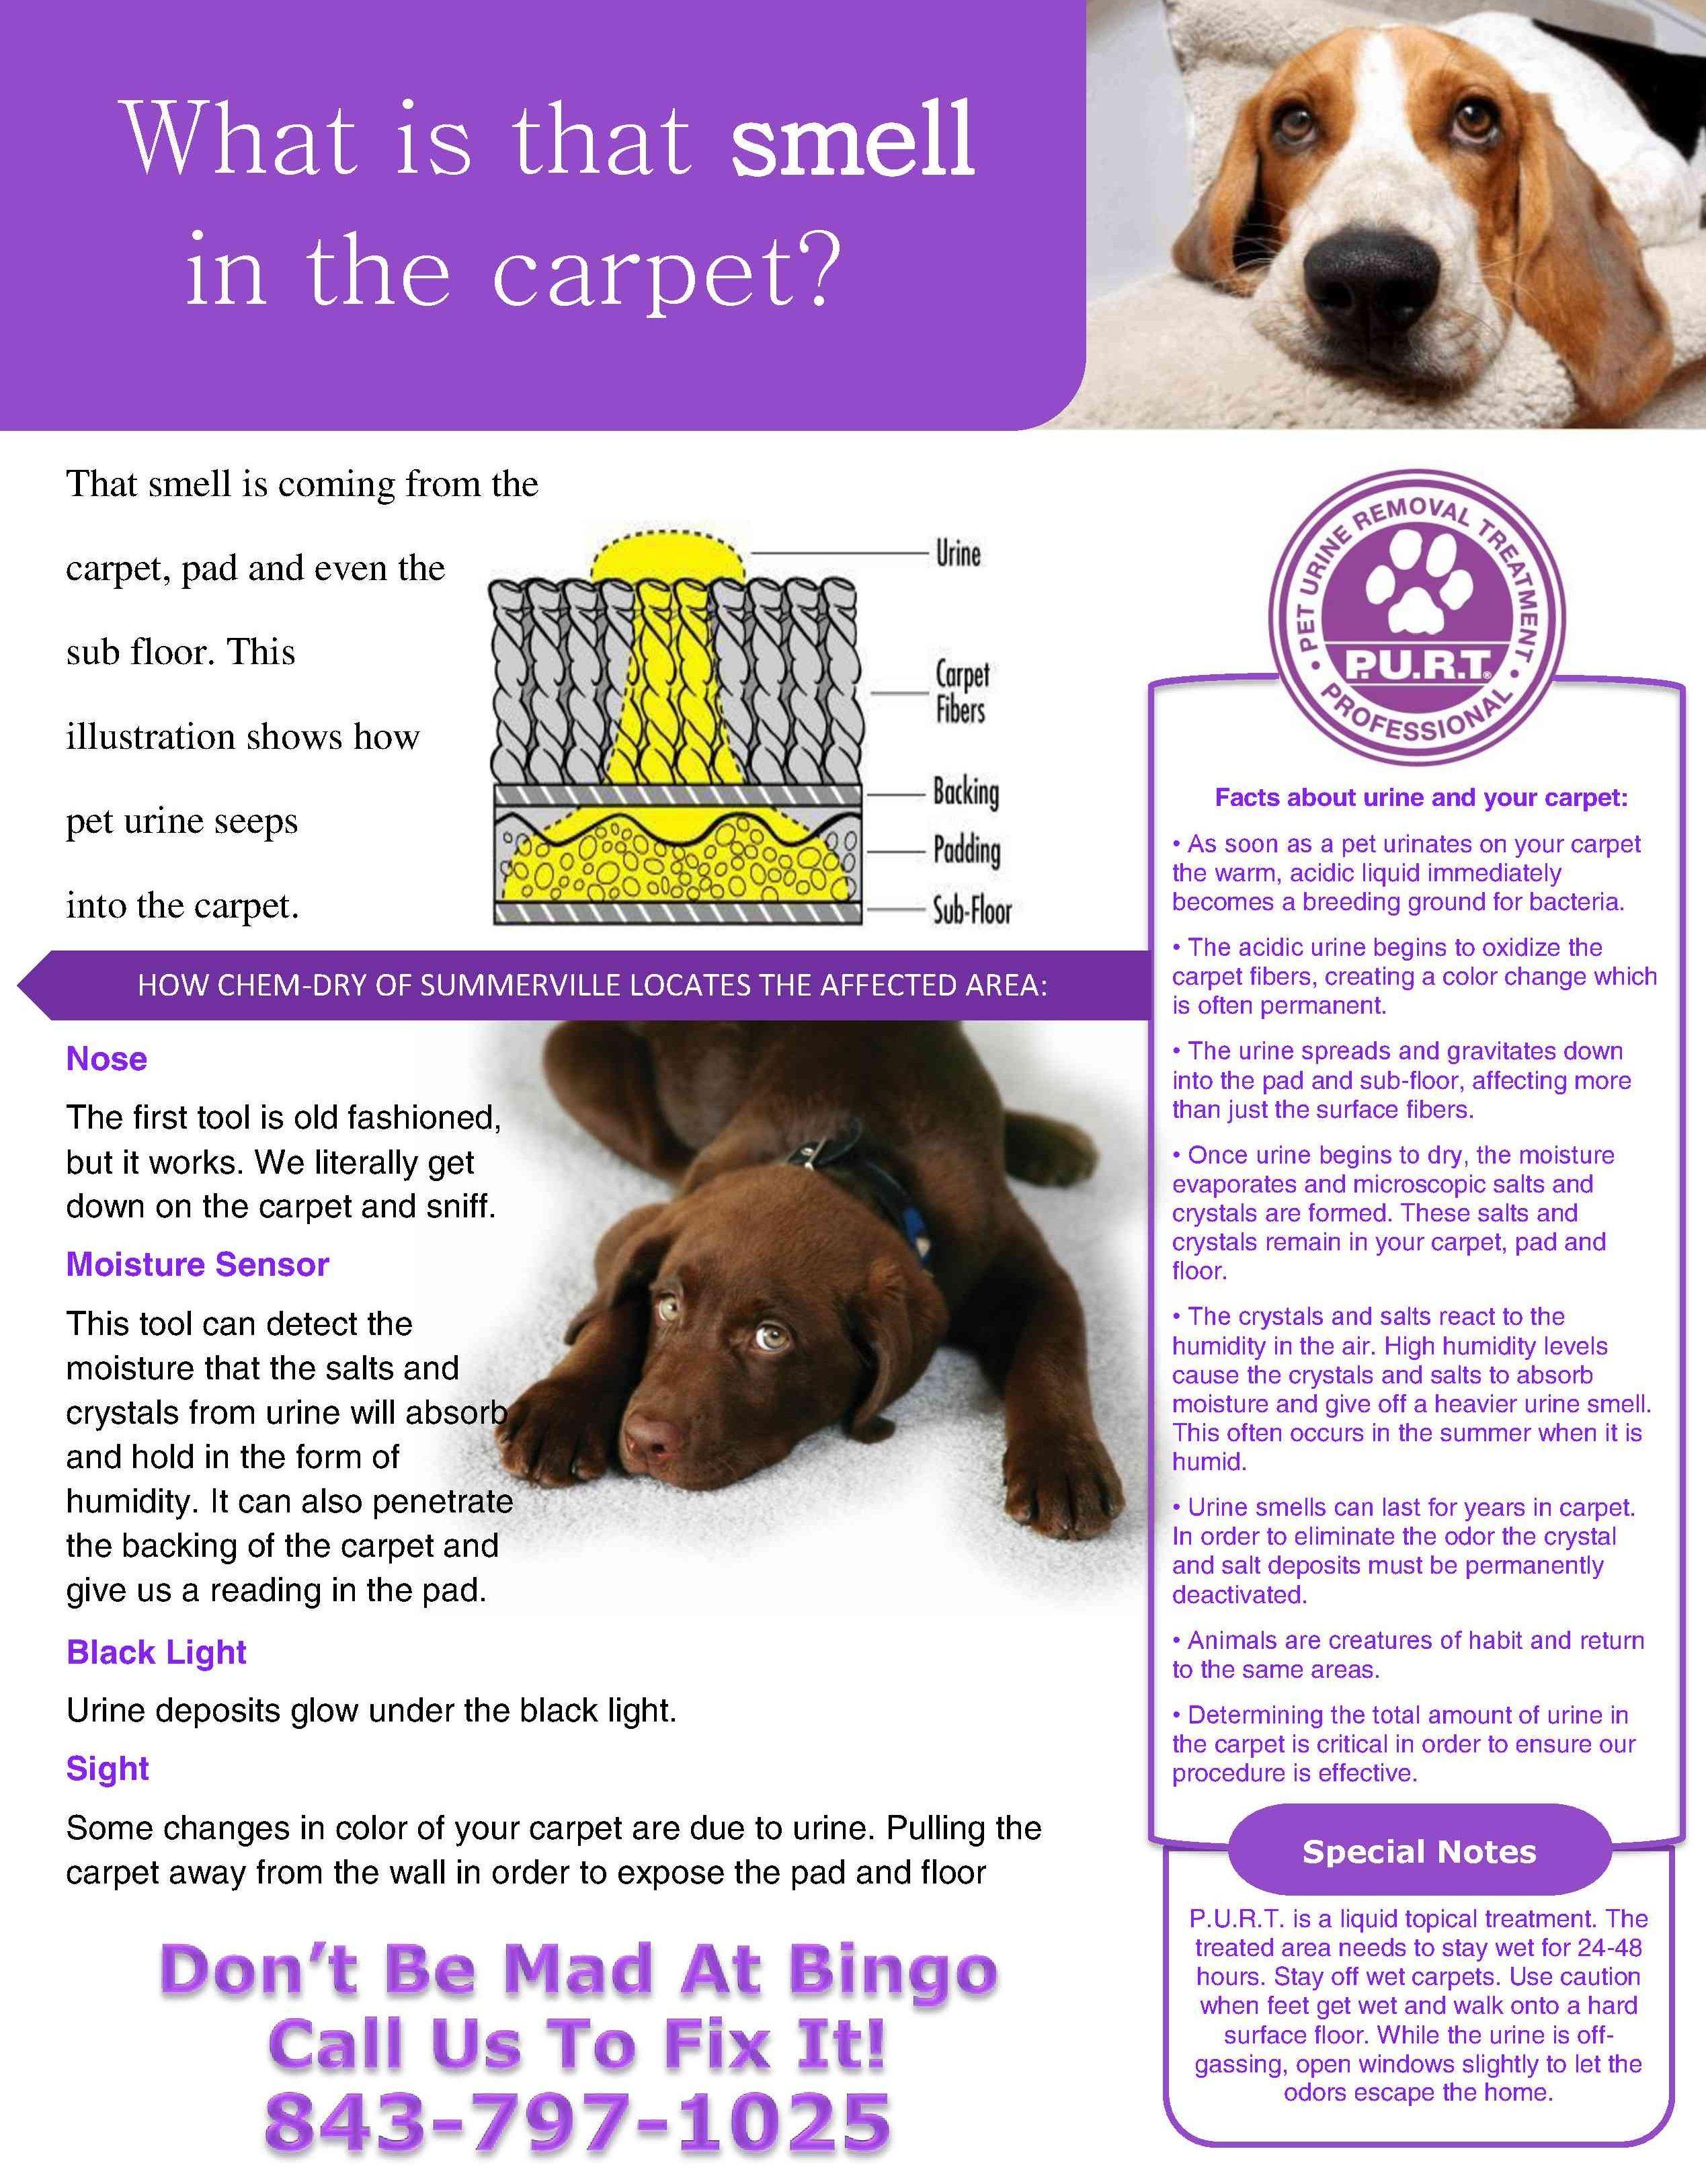 Pet Urine Carpeting Facts John S Chem Dry In Bellingham Wa